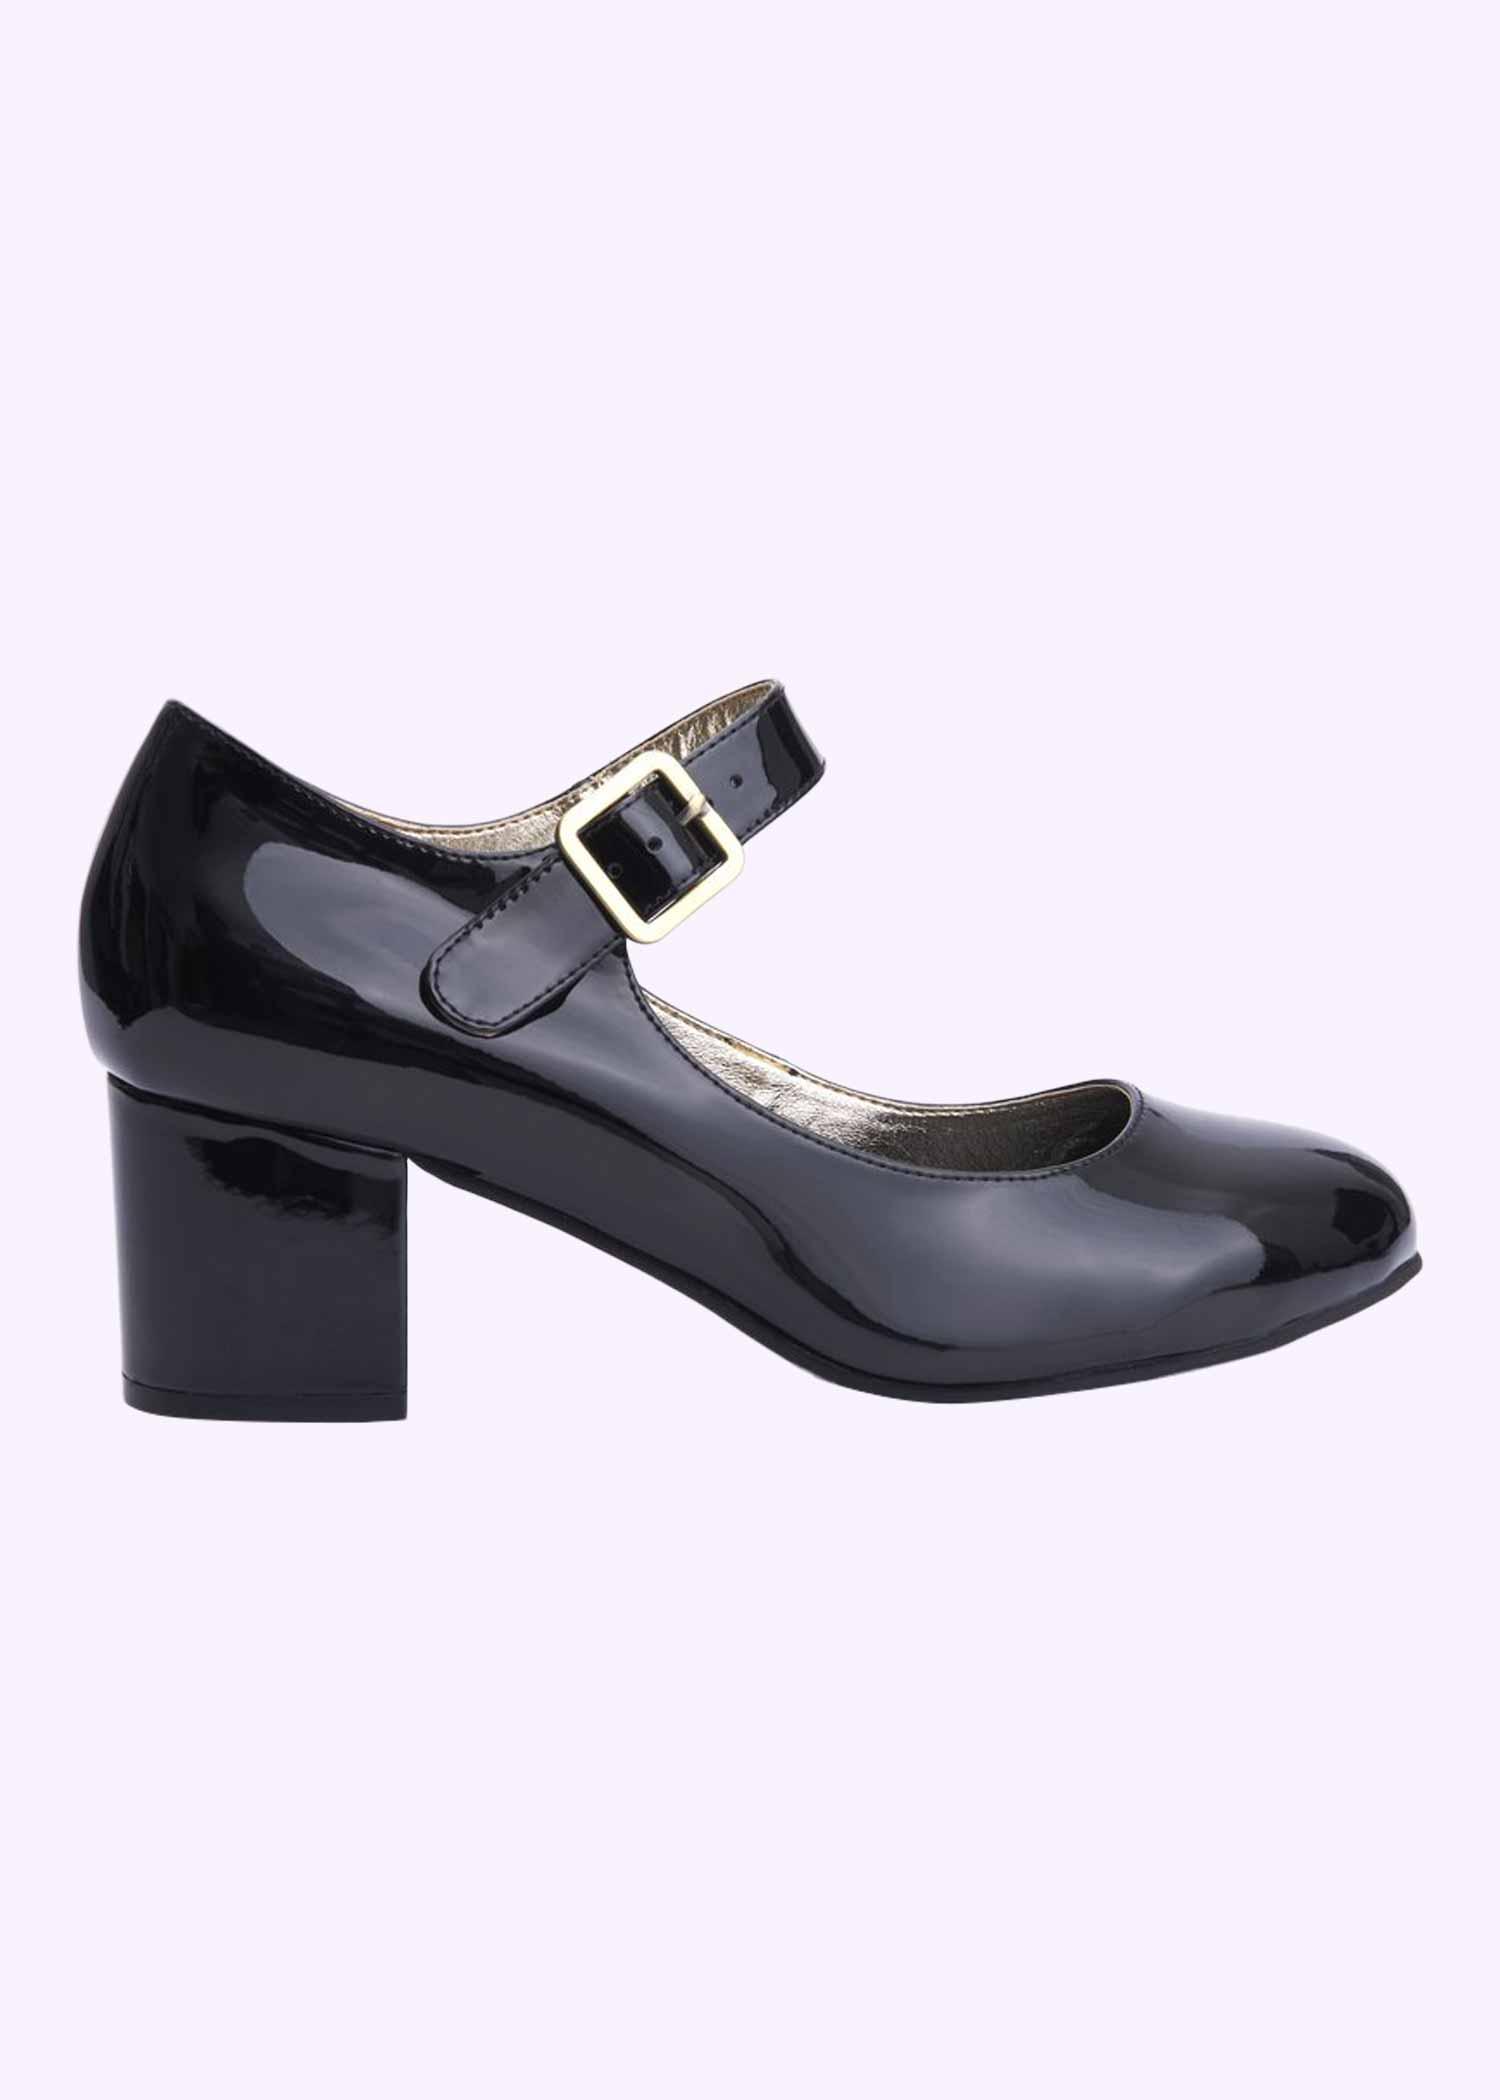 60'er Mary Jane sko i sort lak fra Lola Ramona